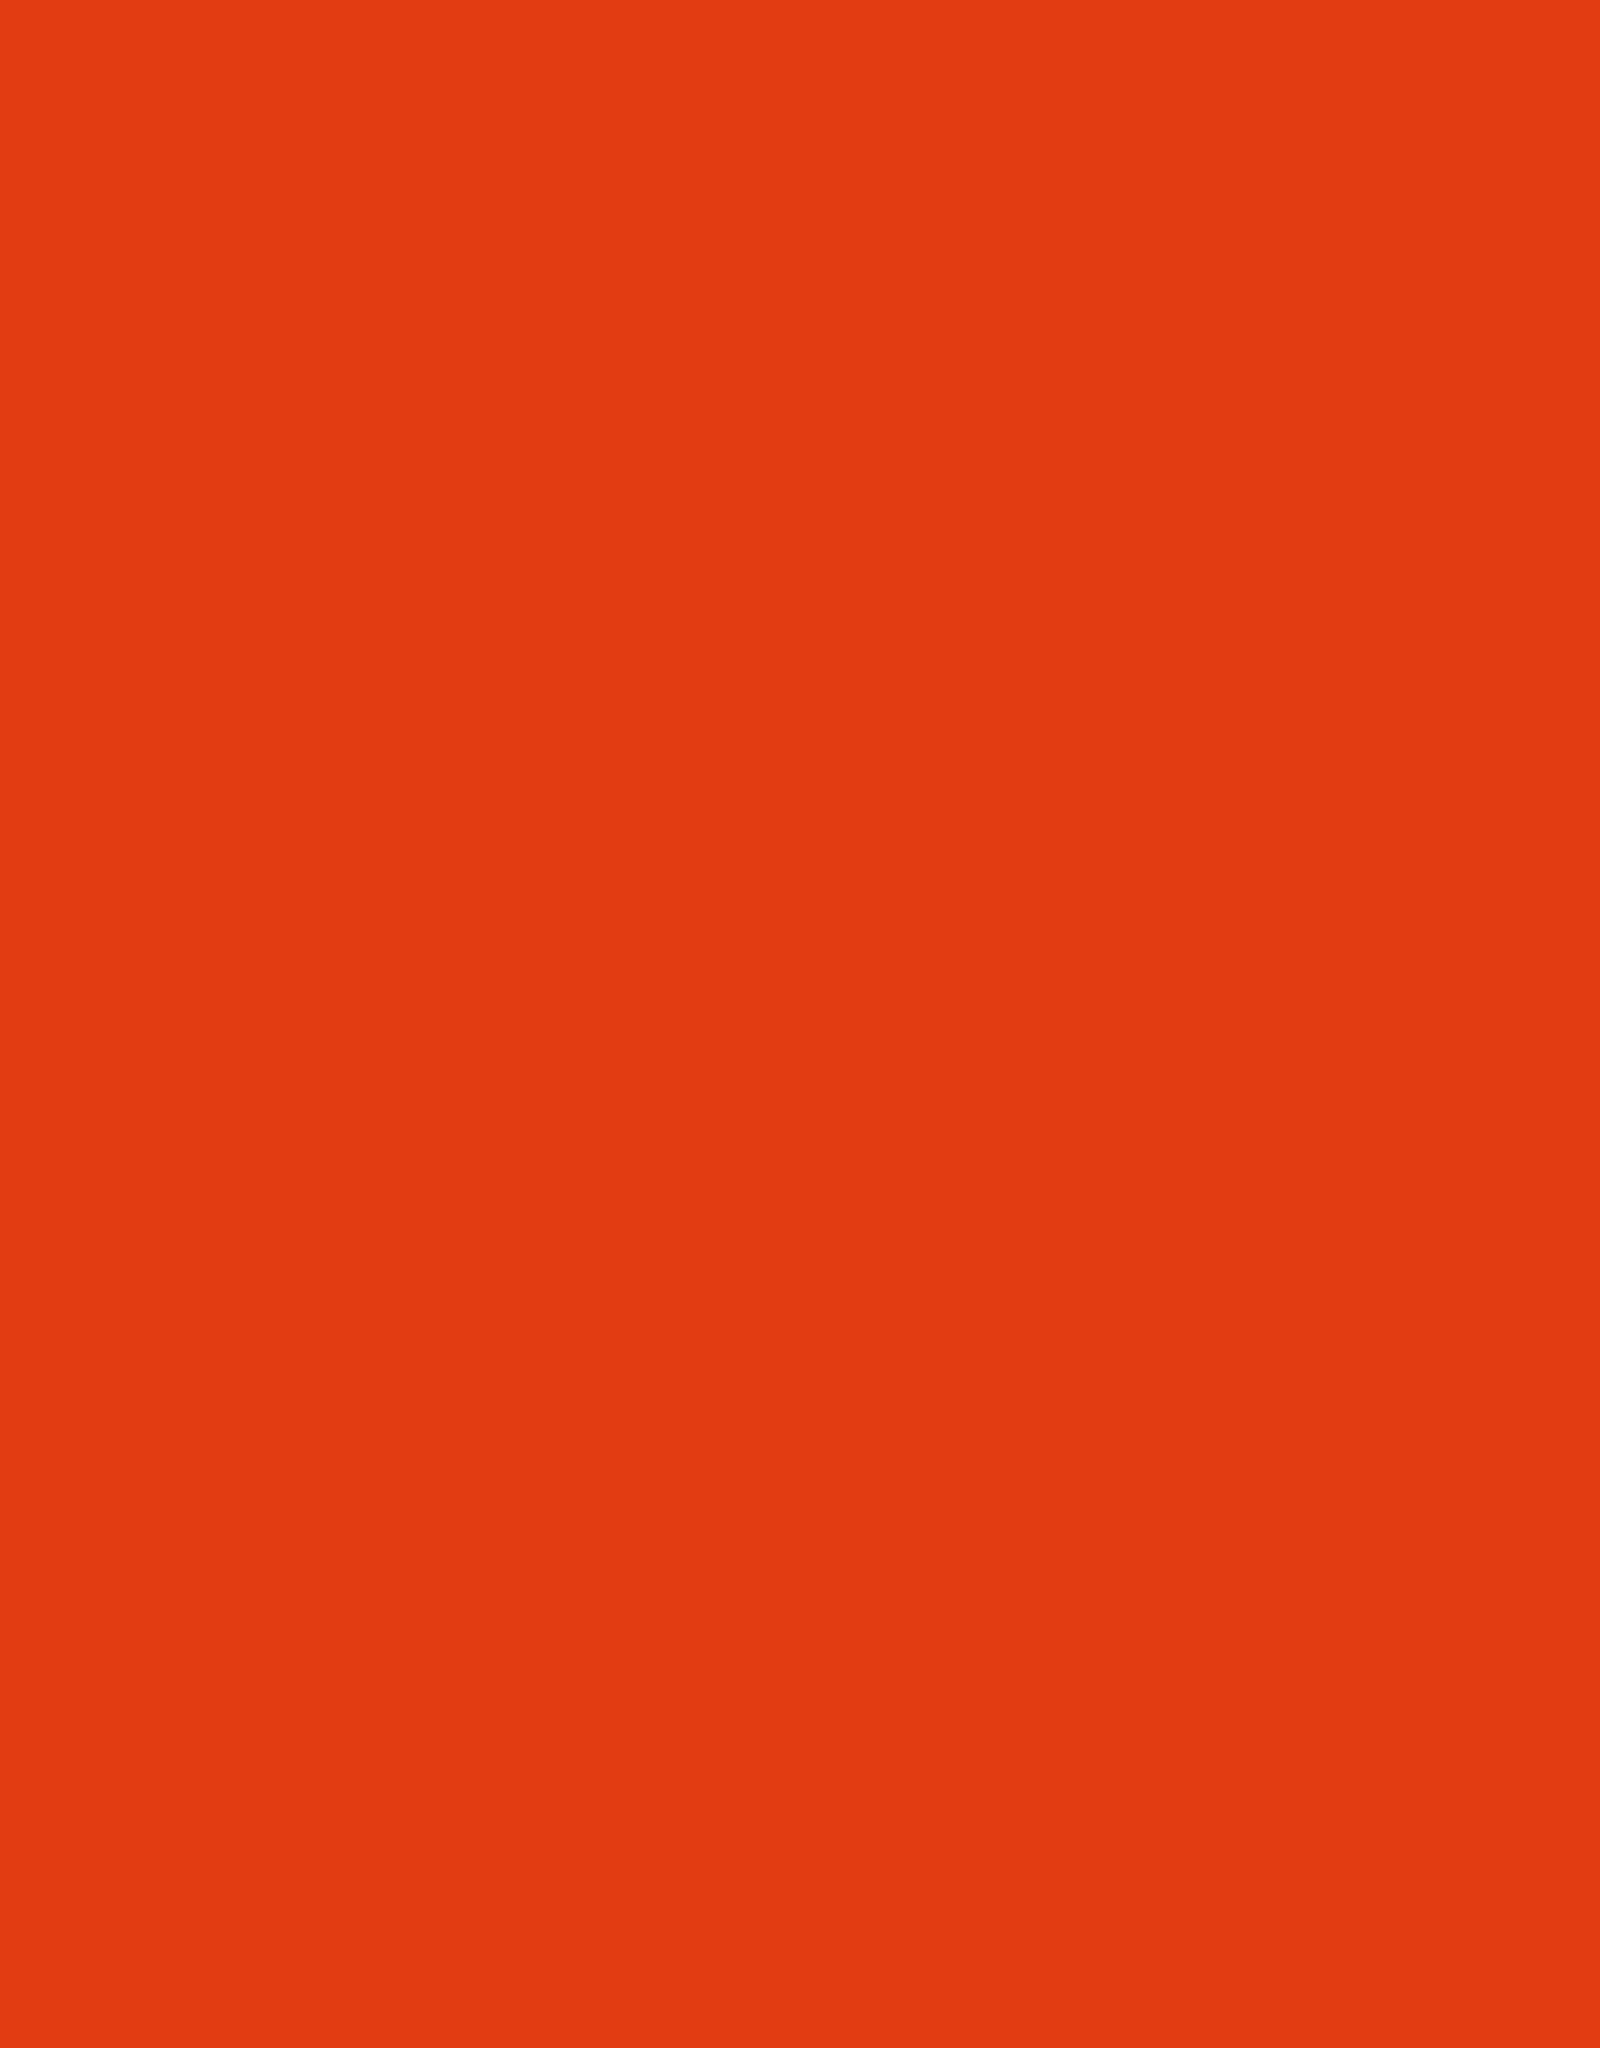 Trapsuutjies Textile Paint Orange